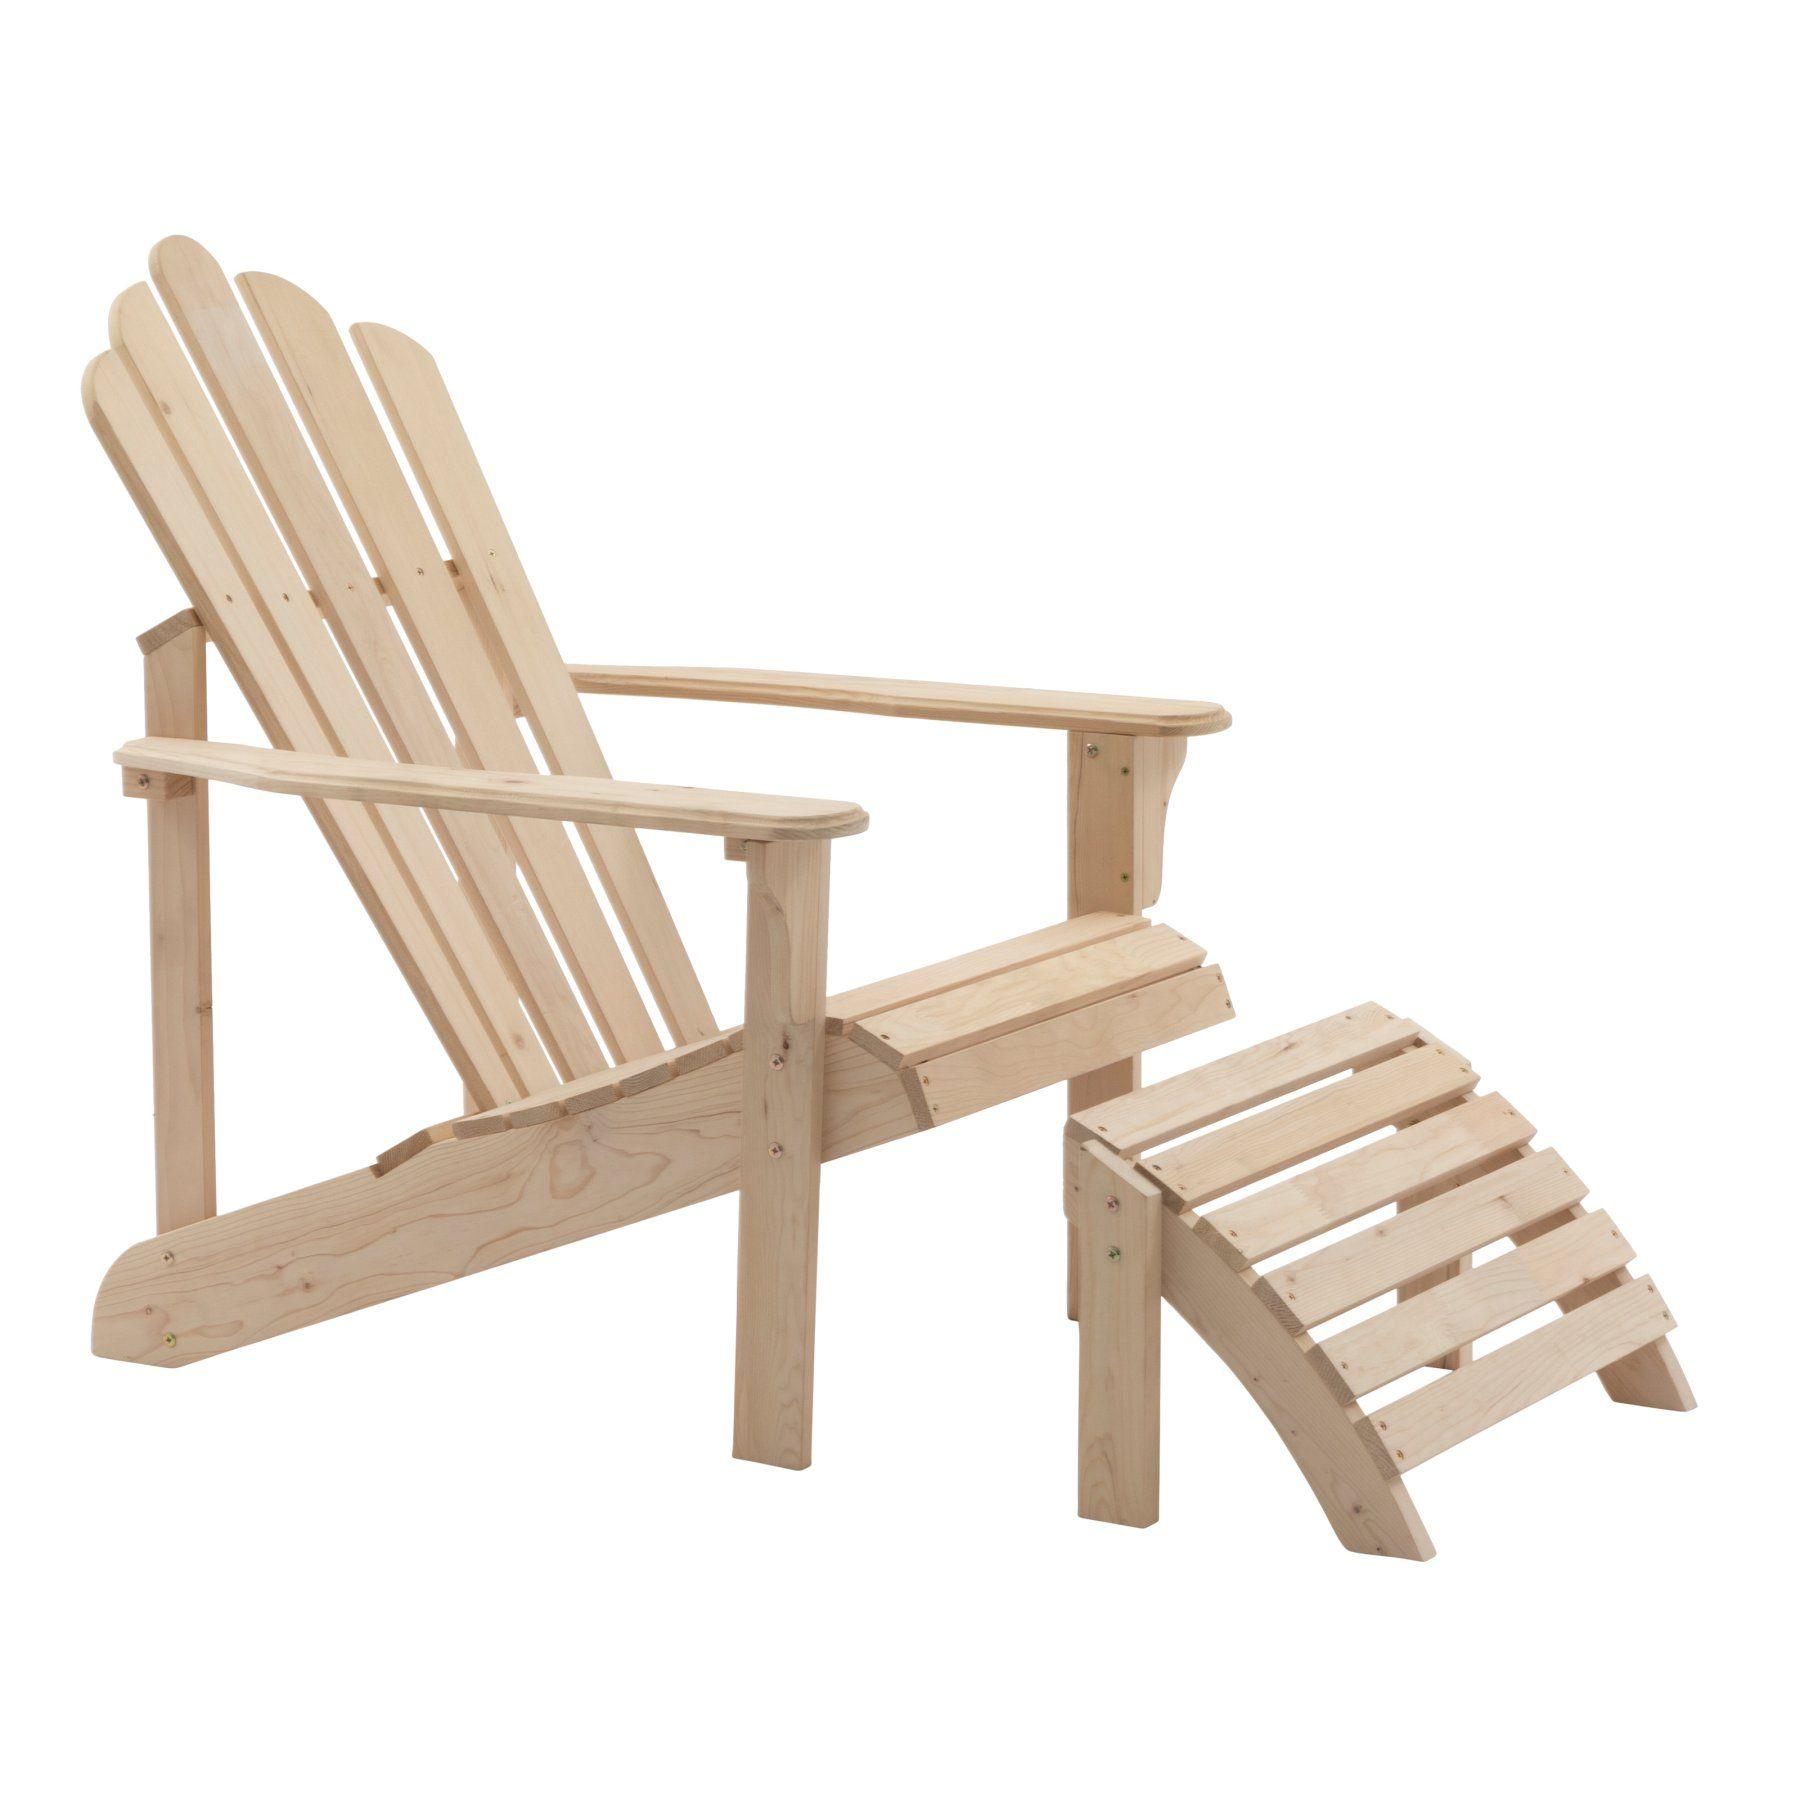 Coral Coast Hubbard Wooden Adirondack Chair Ottoman Unfinished